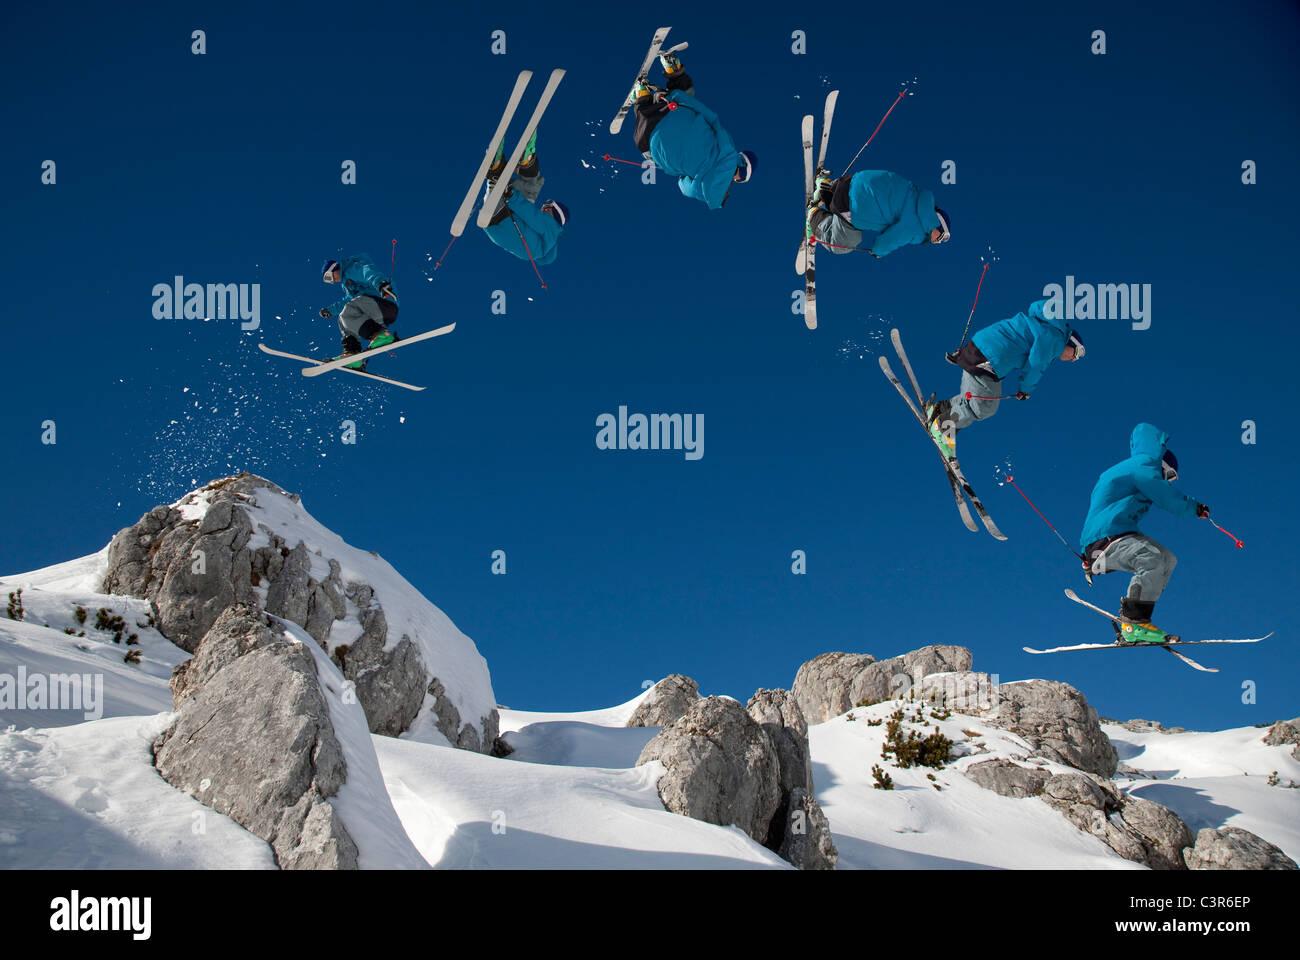 Skier doing dangerous free ride jump - Stock Image